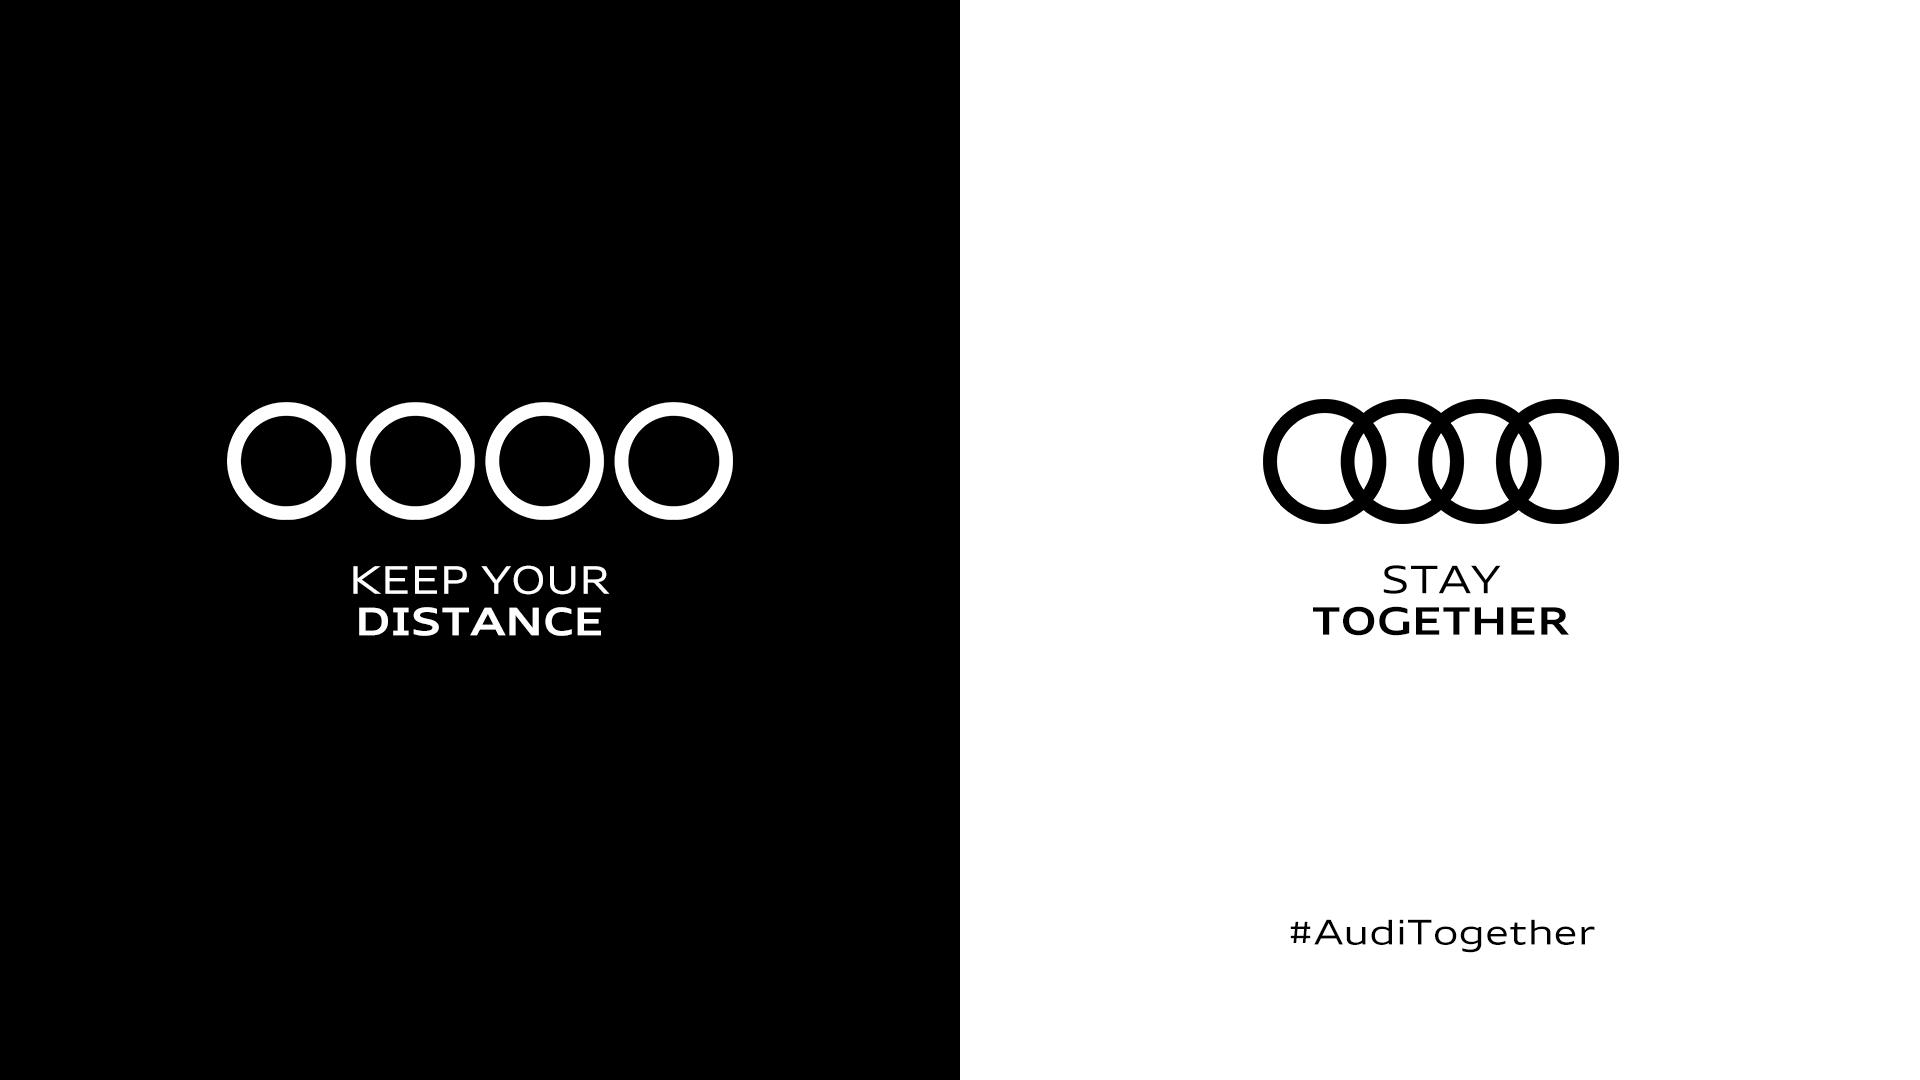 News zu Audi und Corona